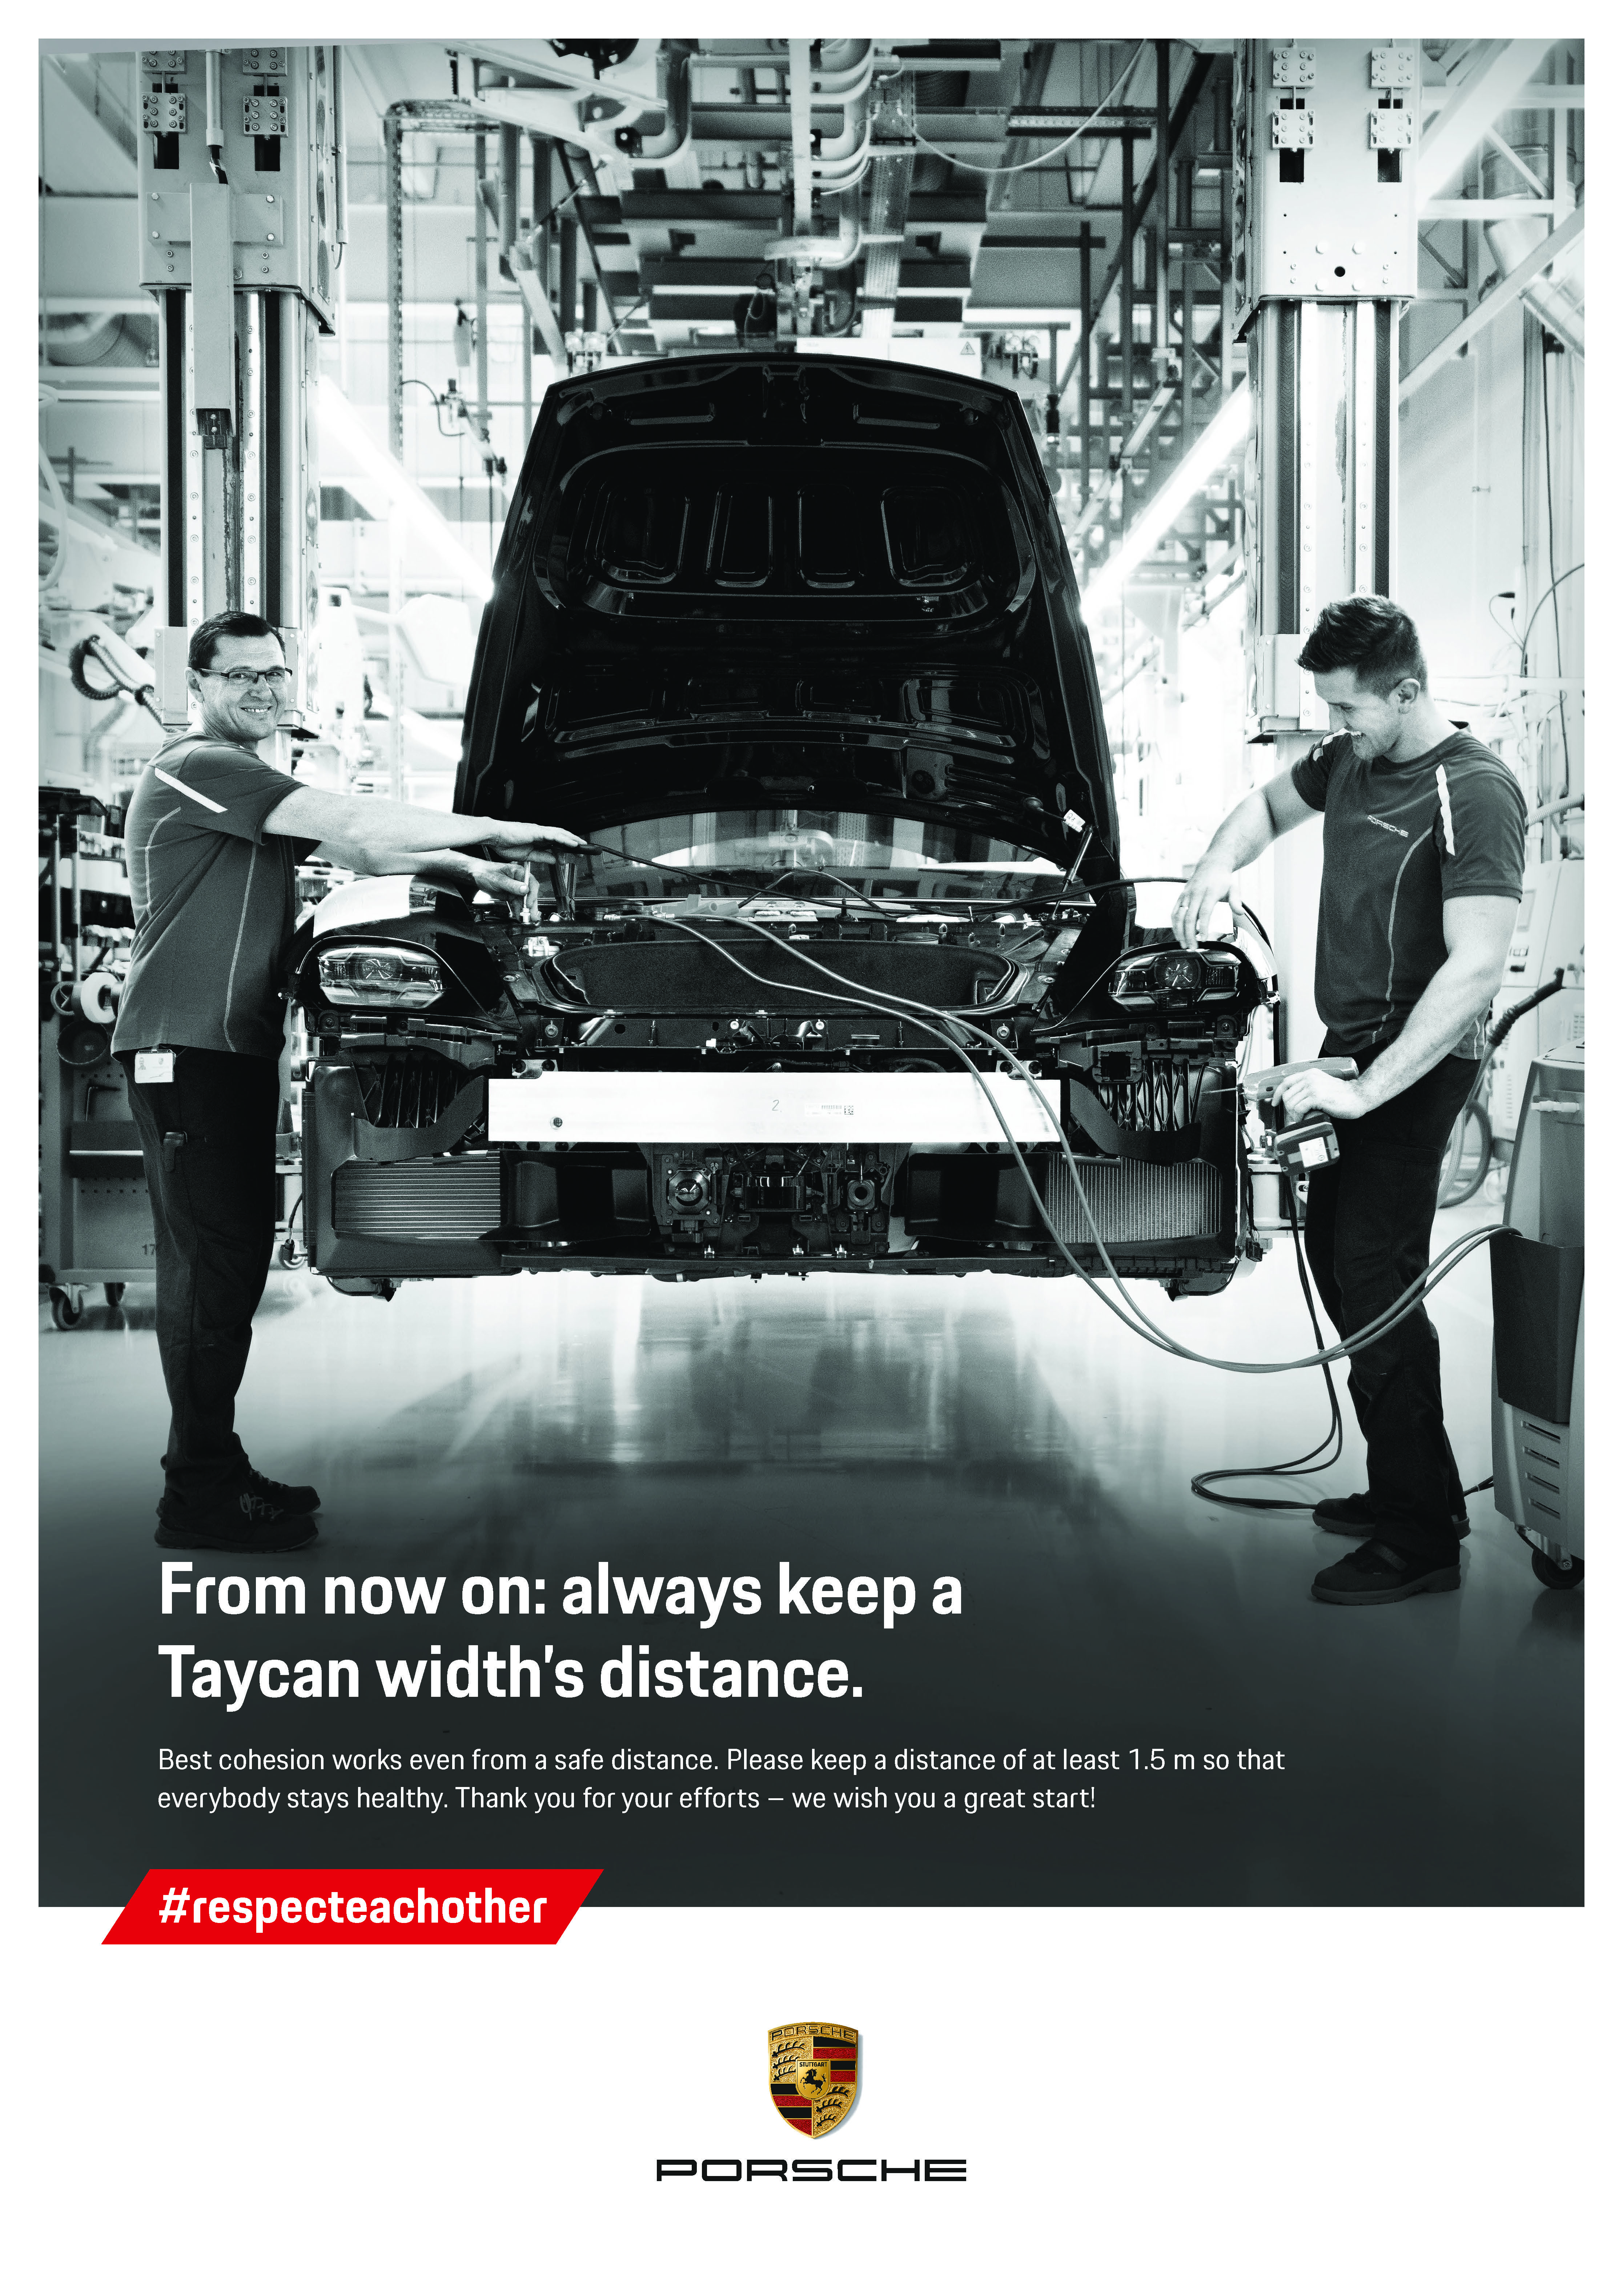 Porsche is a top employer - Image 1